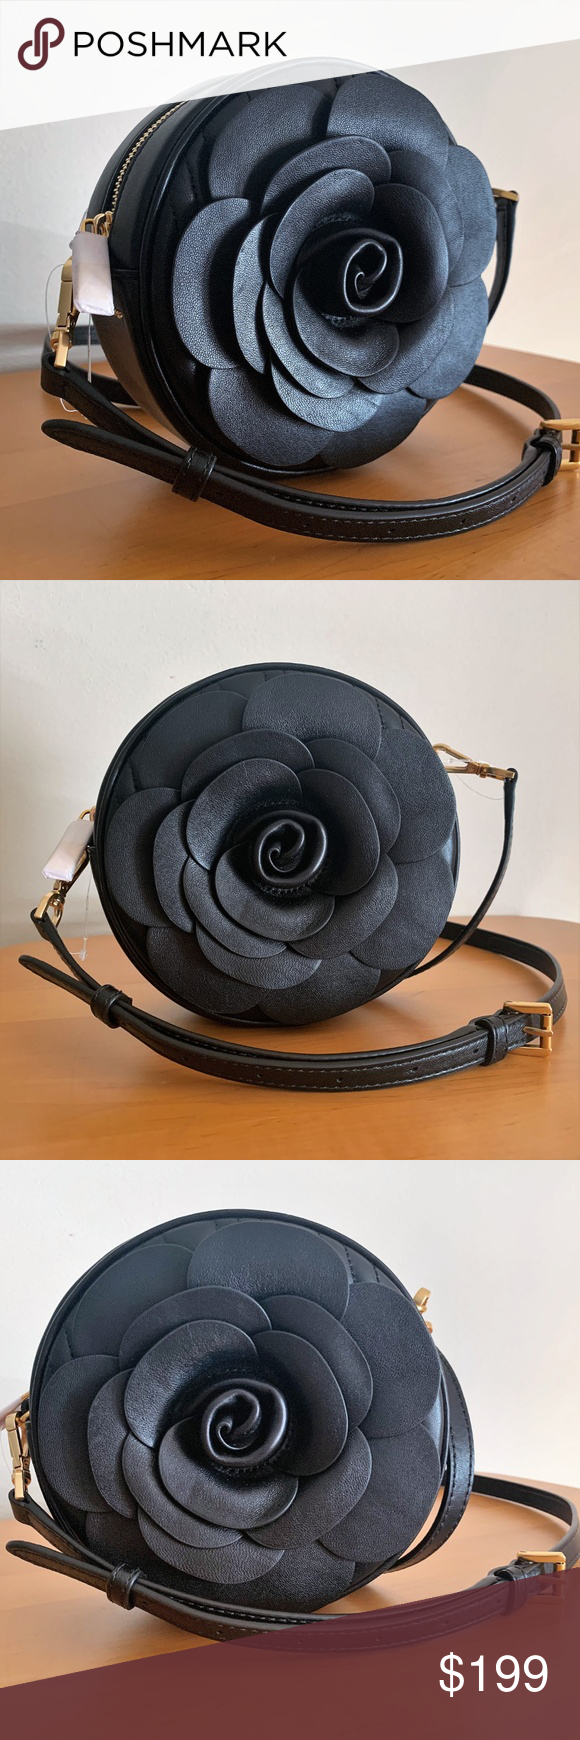 ae15343f4ef3 Michael Kors Canteen Bag ~ Vivianne 3D Rose Petals Michael Kors Vivianne  Canteen Bag BRAND NEW